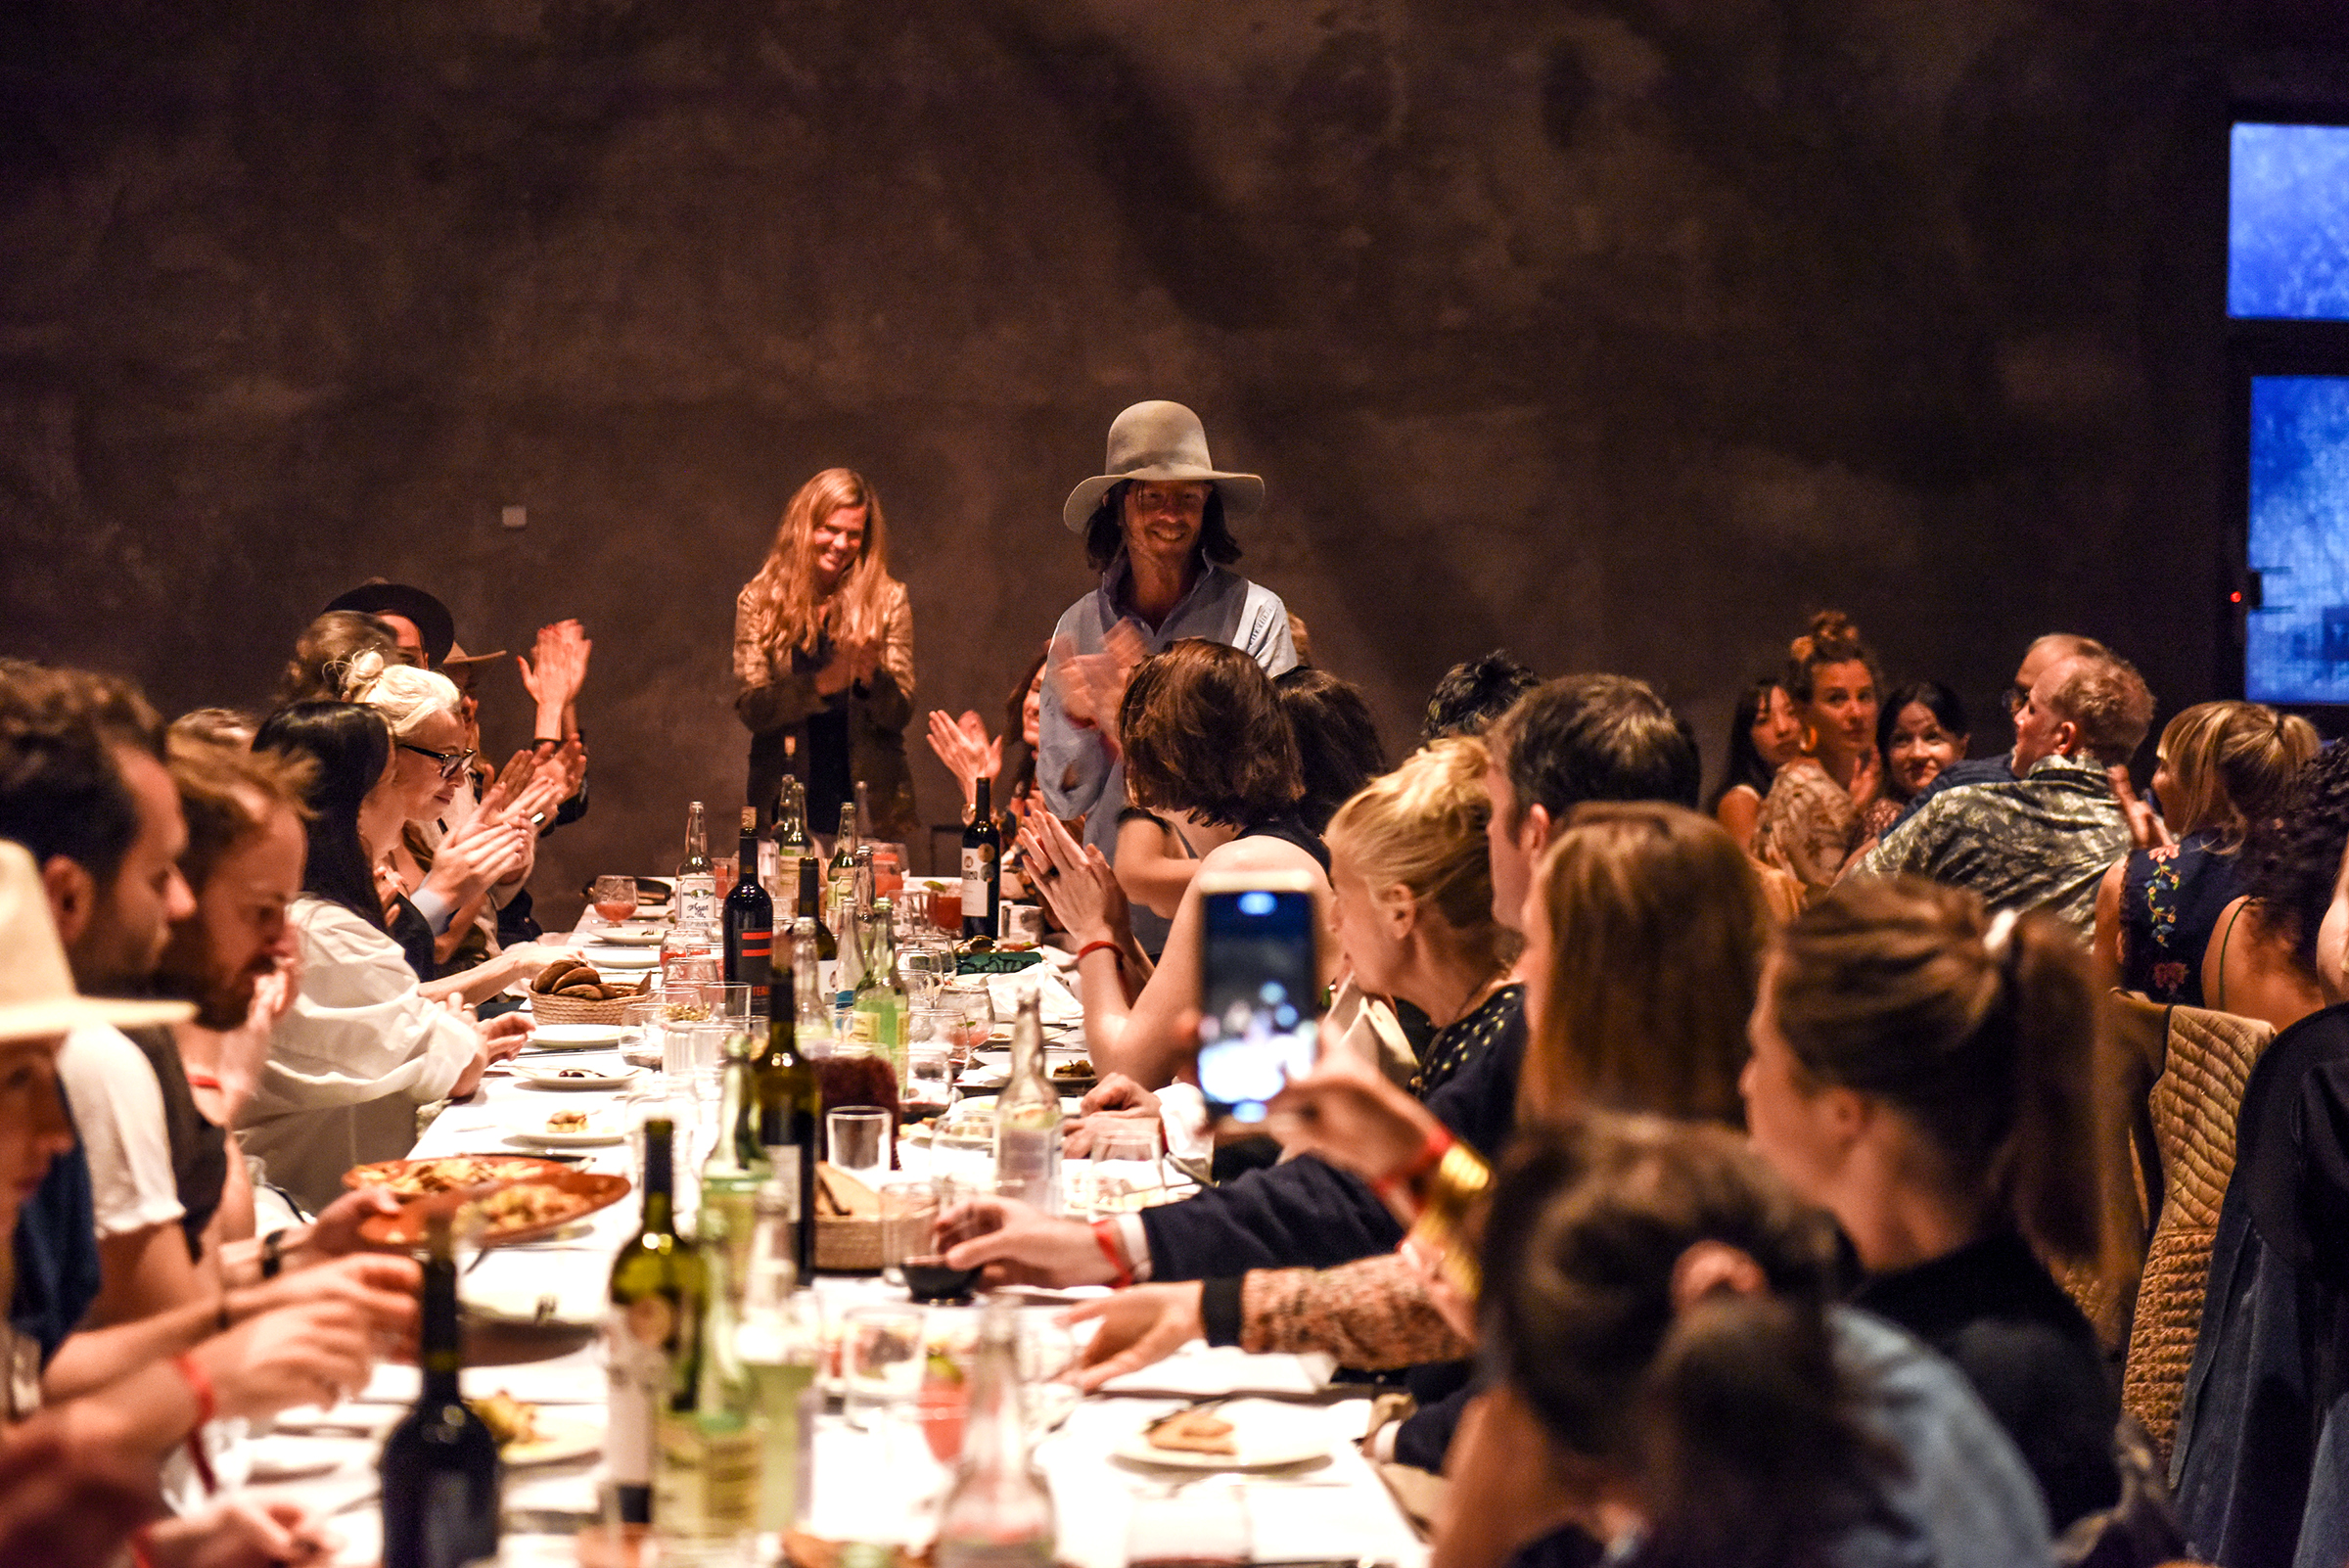 MI COCKTAIL RECEPTION + DINNER | THE CAPRI | MARFA  Kimberly Gould, Michael Phelan